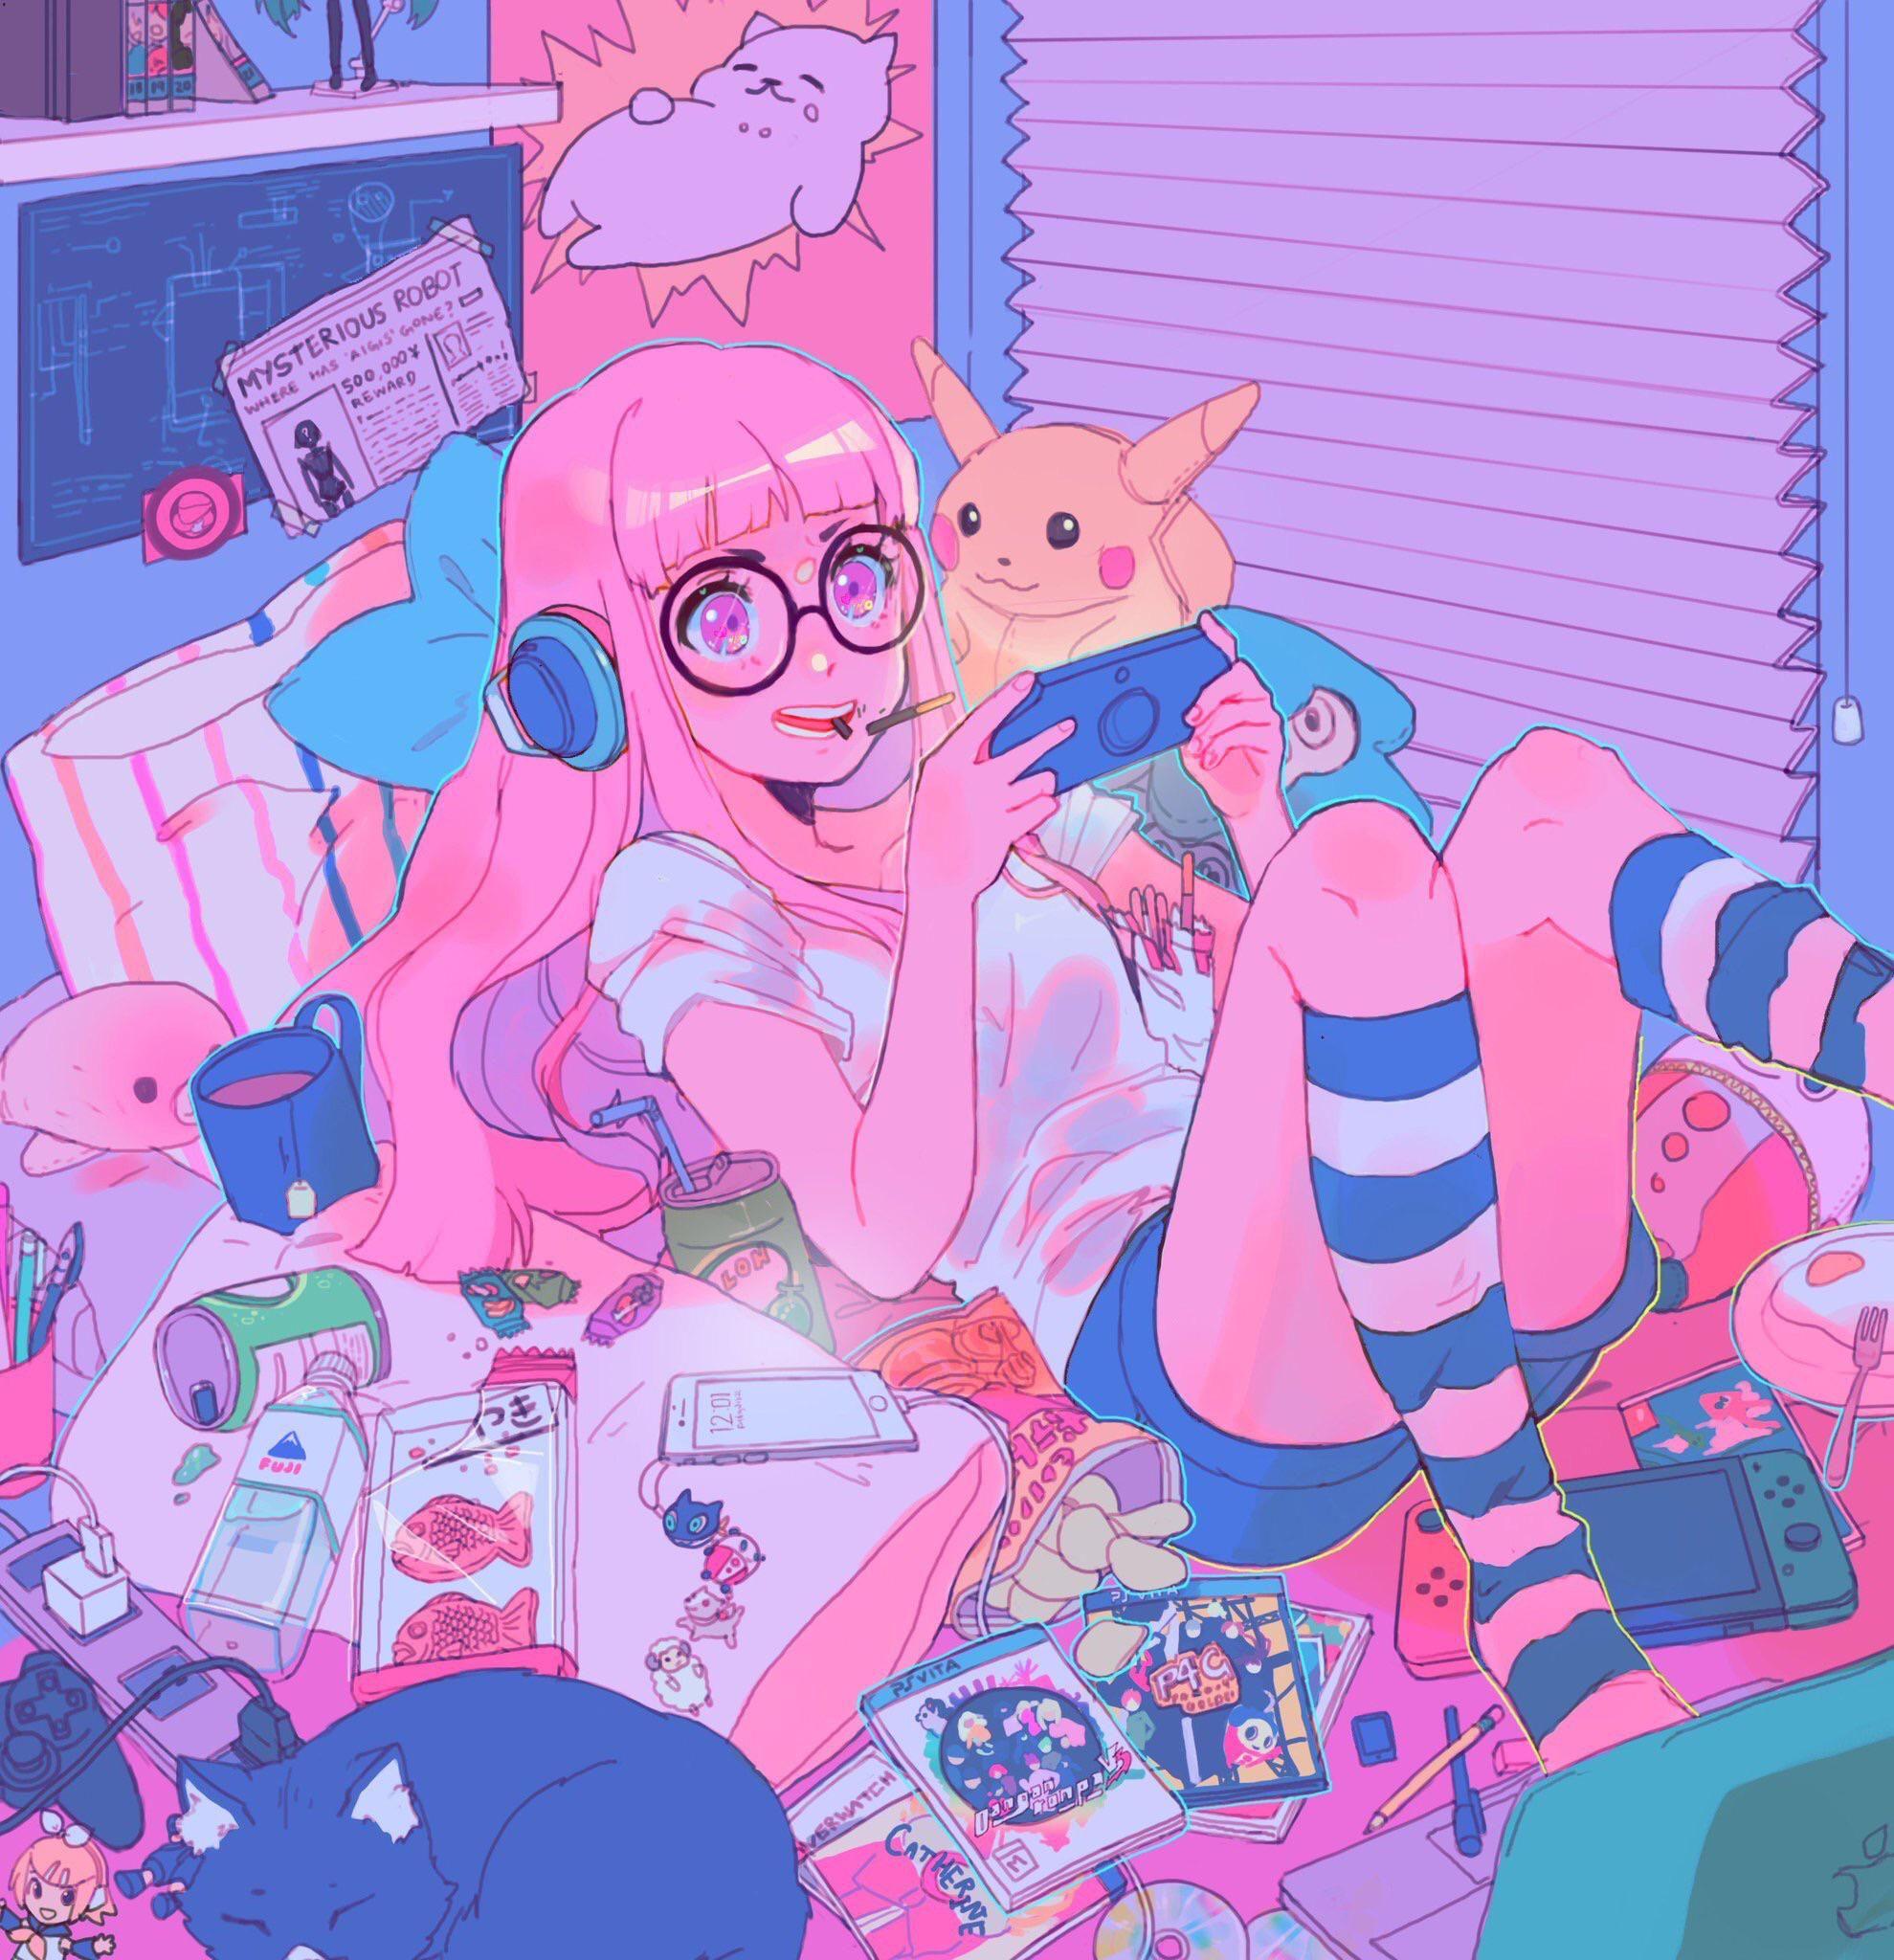 Gamer Girl [hiyo] Persona5 Cute art styles, Aesthetic